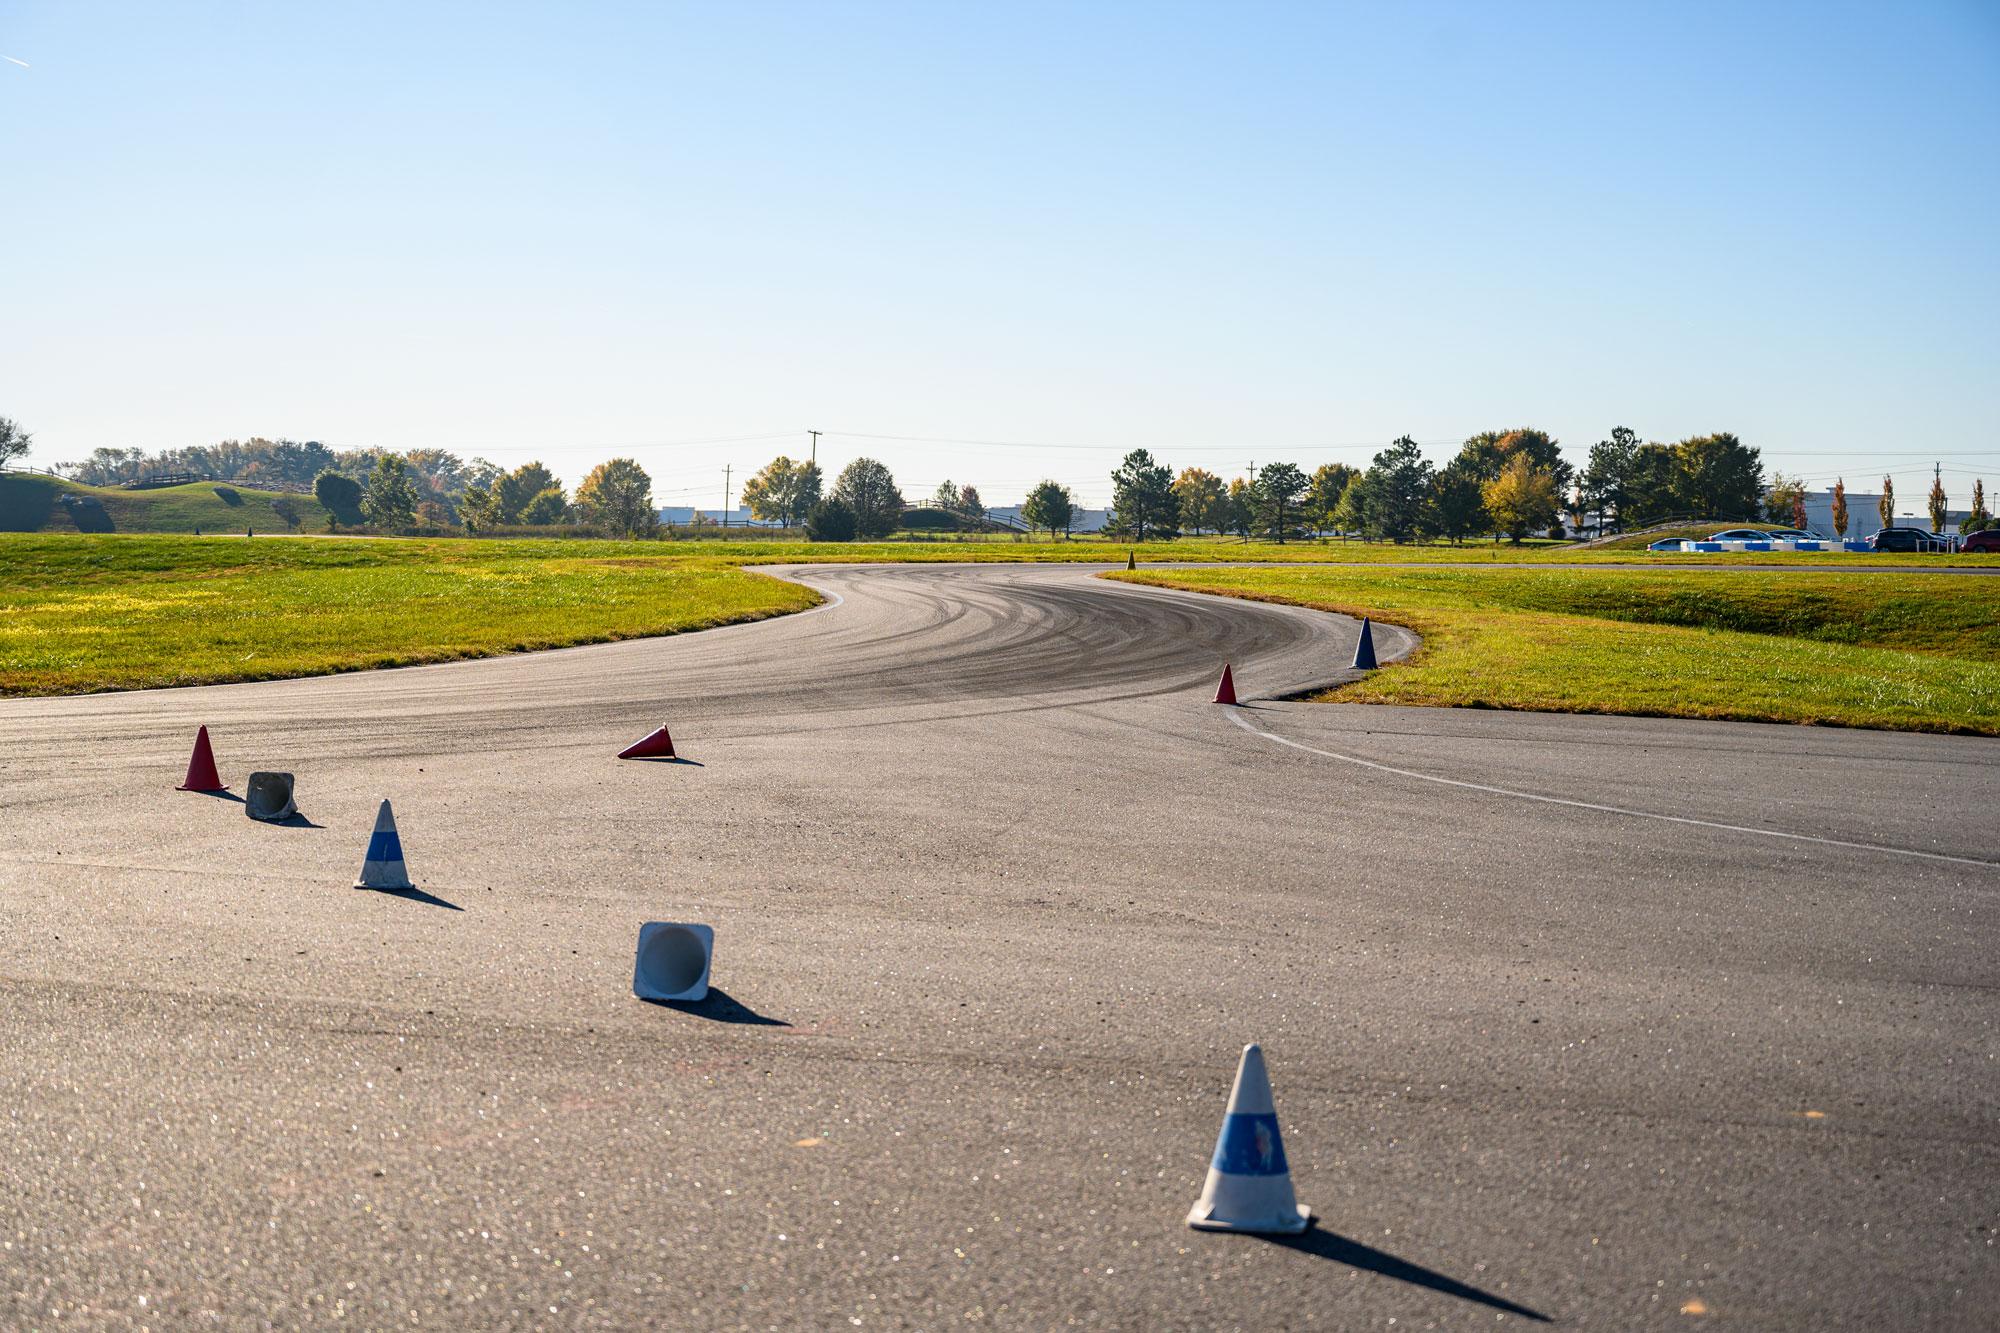 autocross-bmw-track